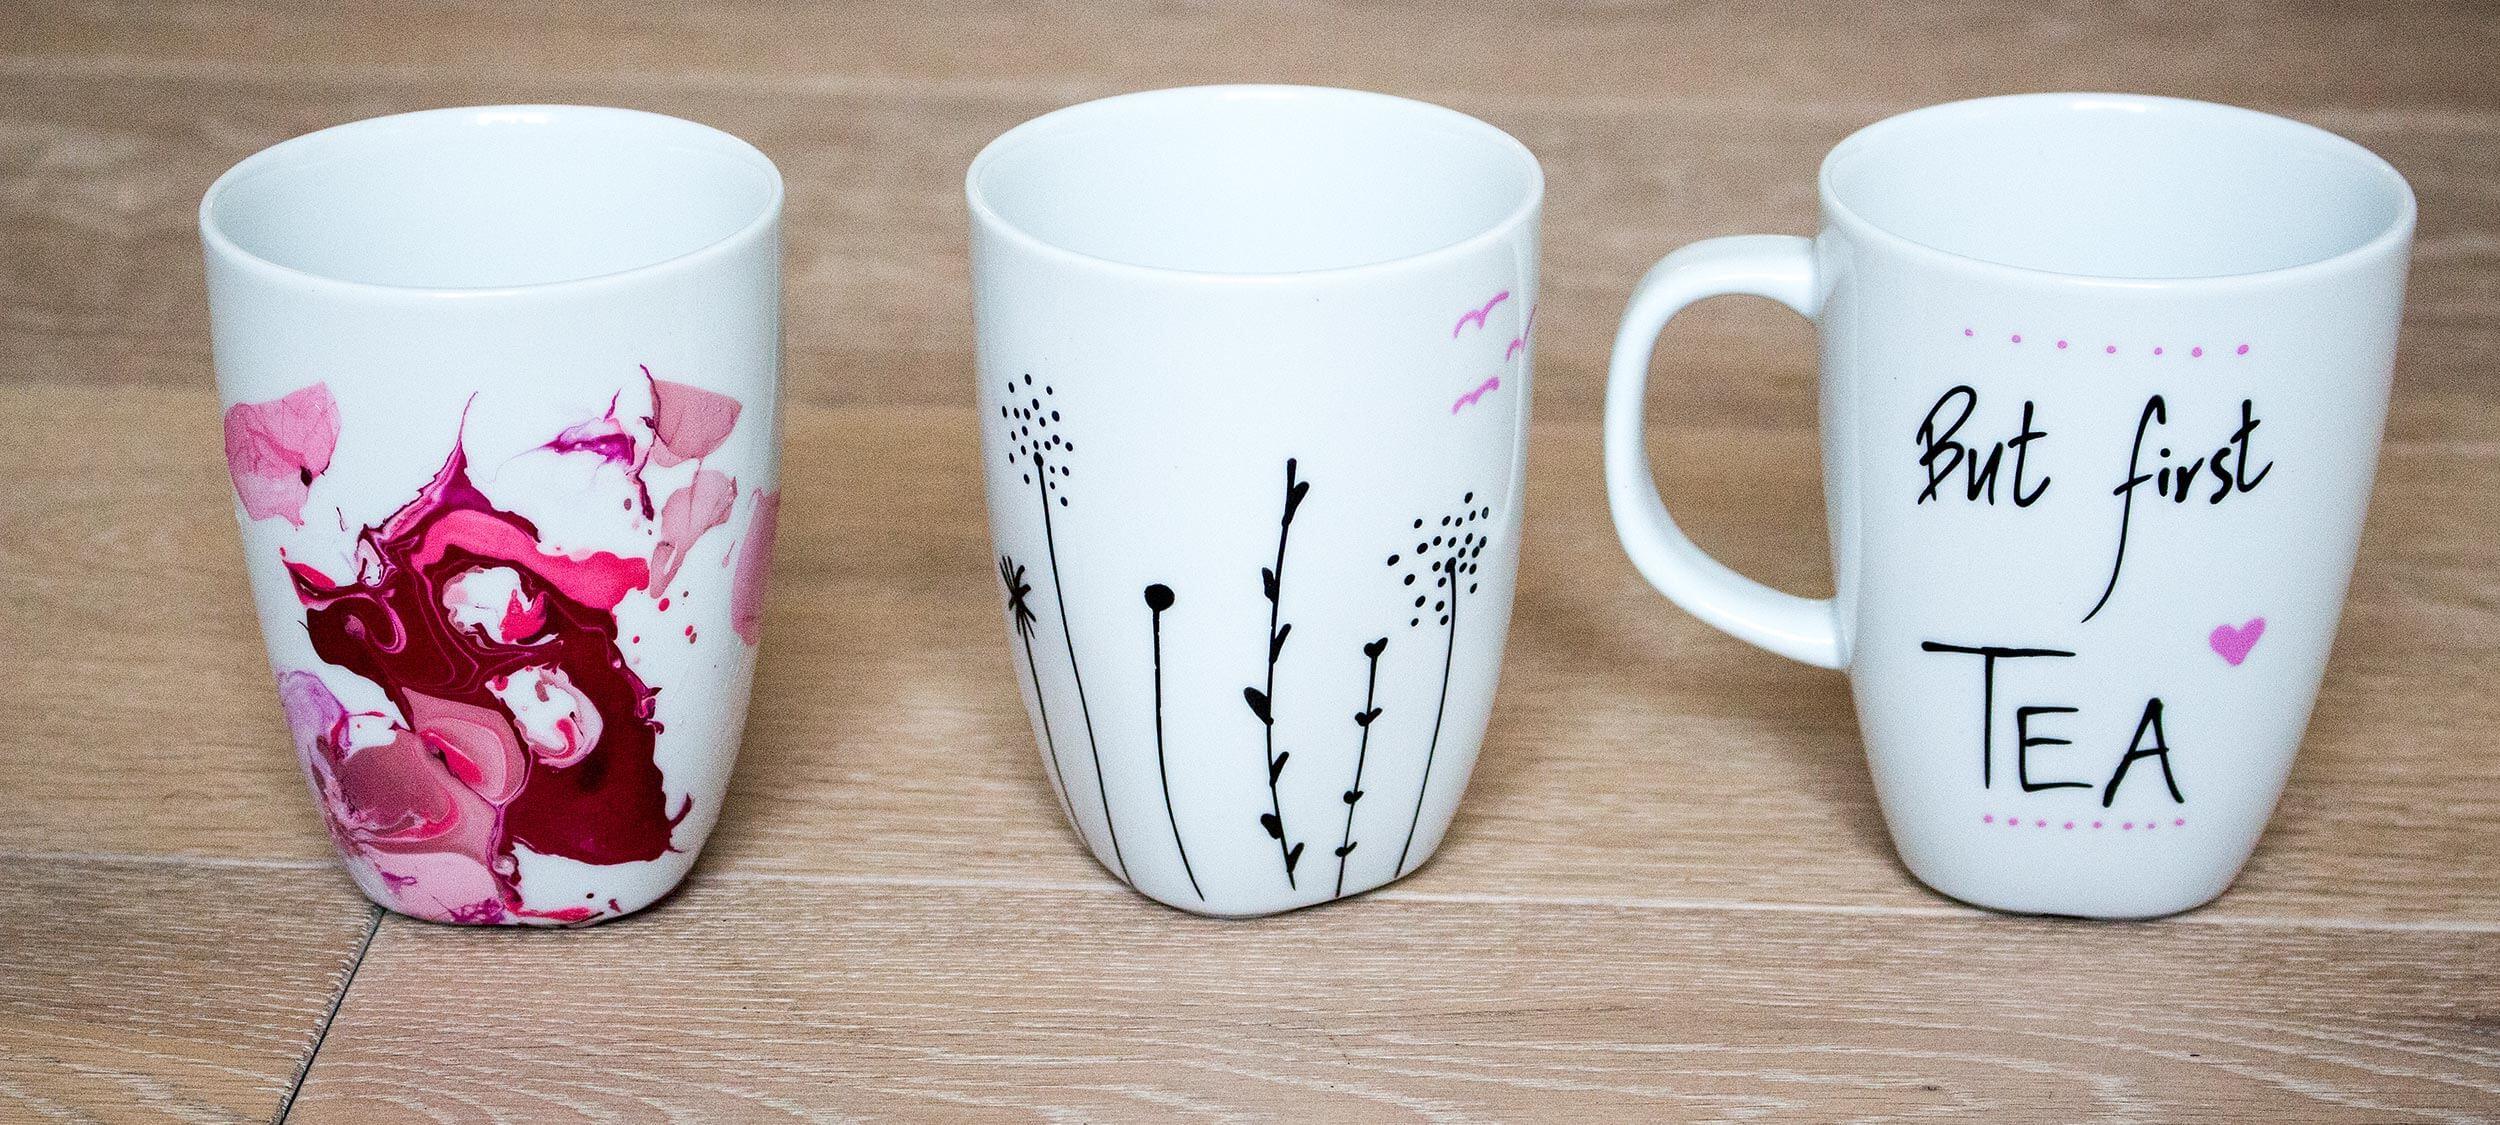 DIY- Tassen selbst gestalten